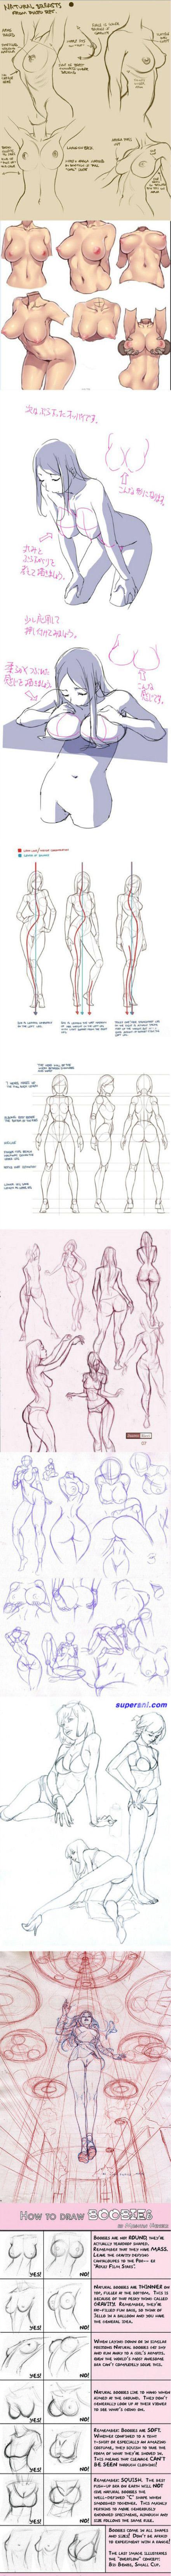 Dibujo2 | Tattoos | Pinterest | Anatomía, Dibujo y Tutoriales